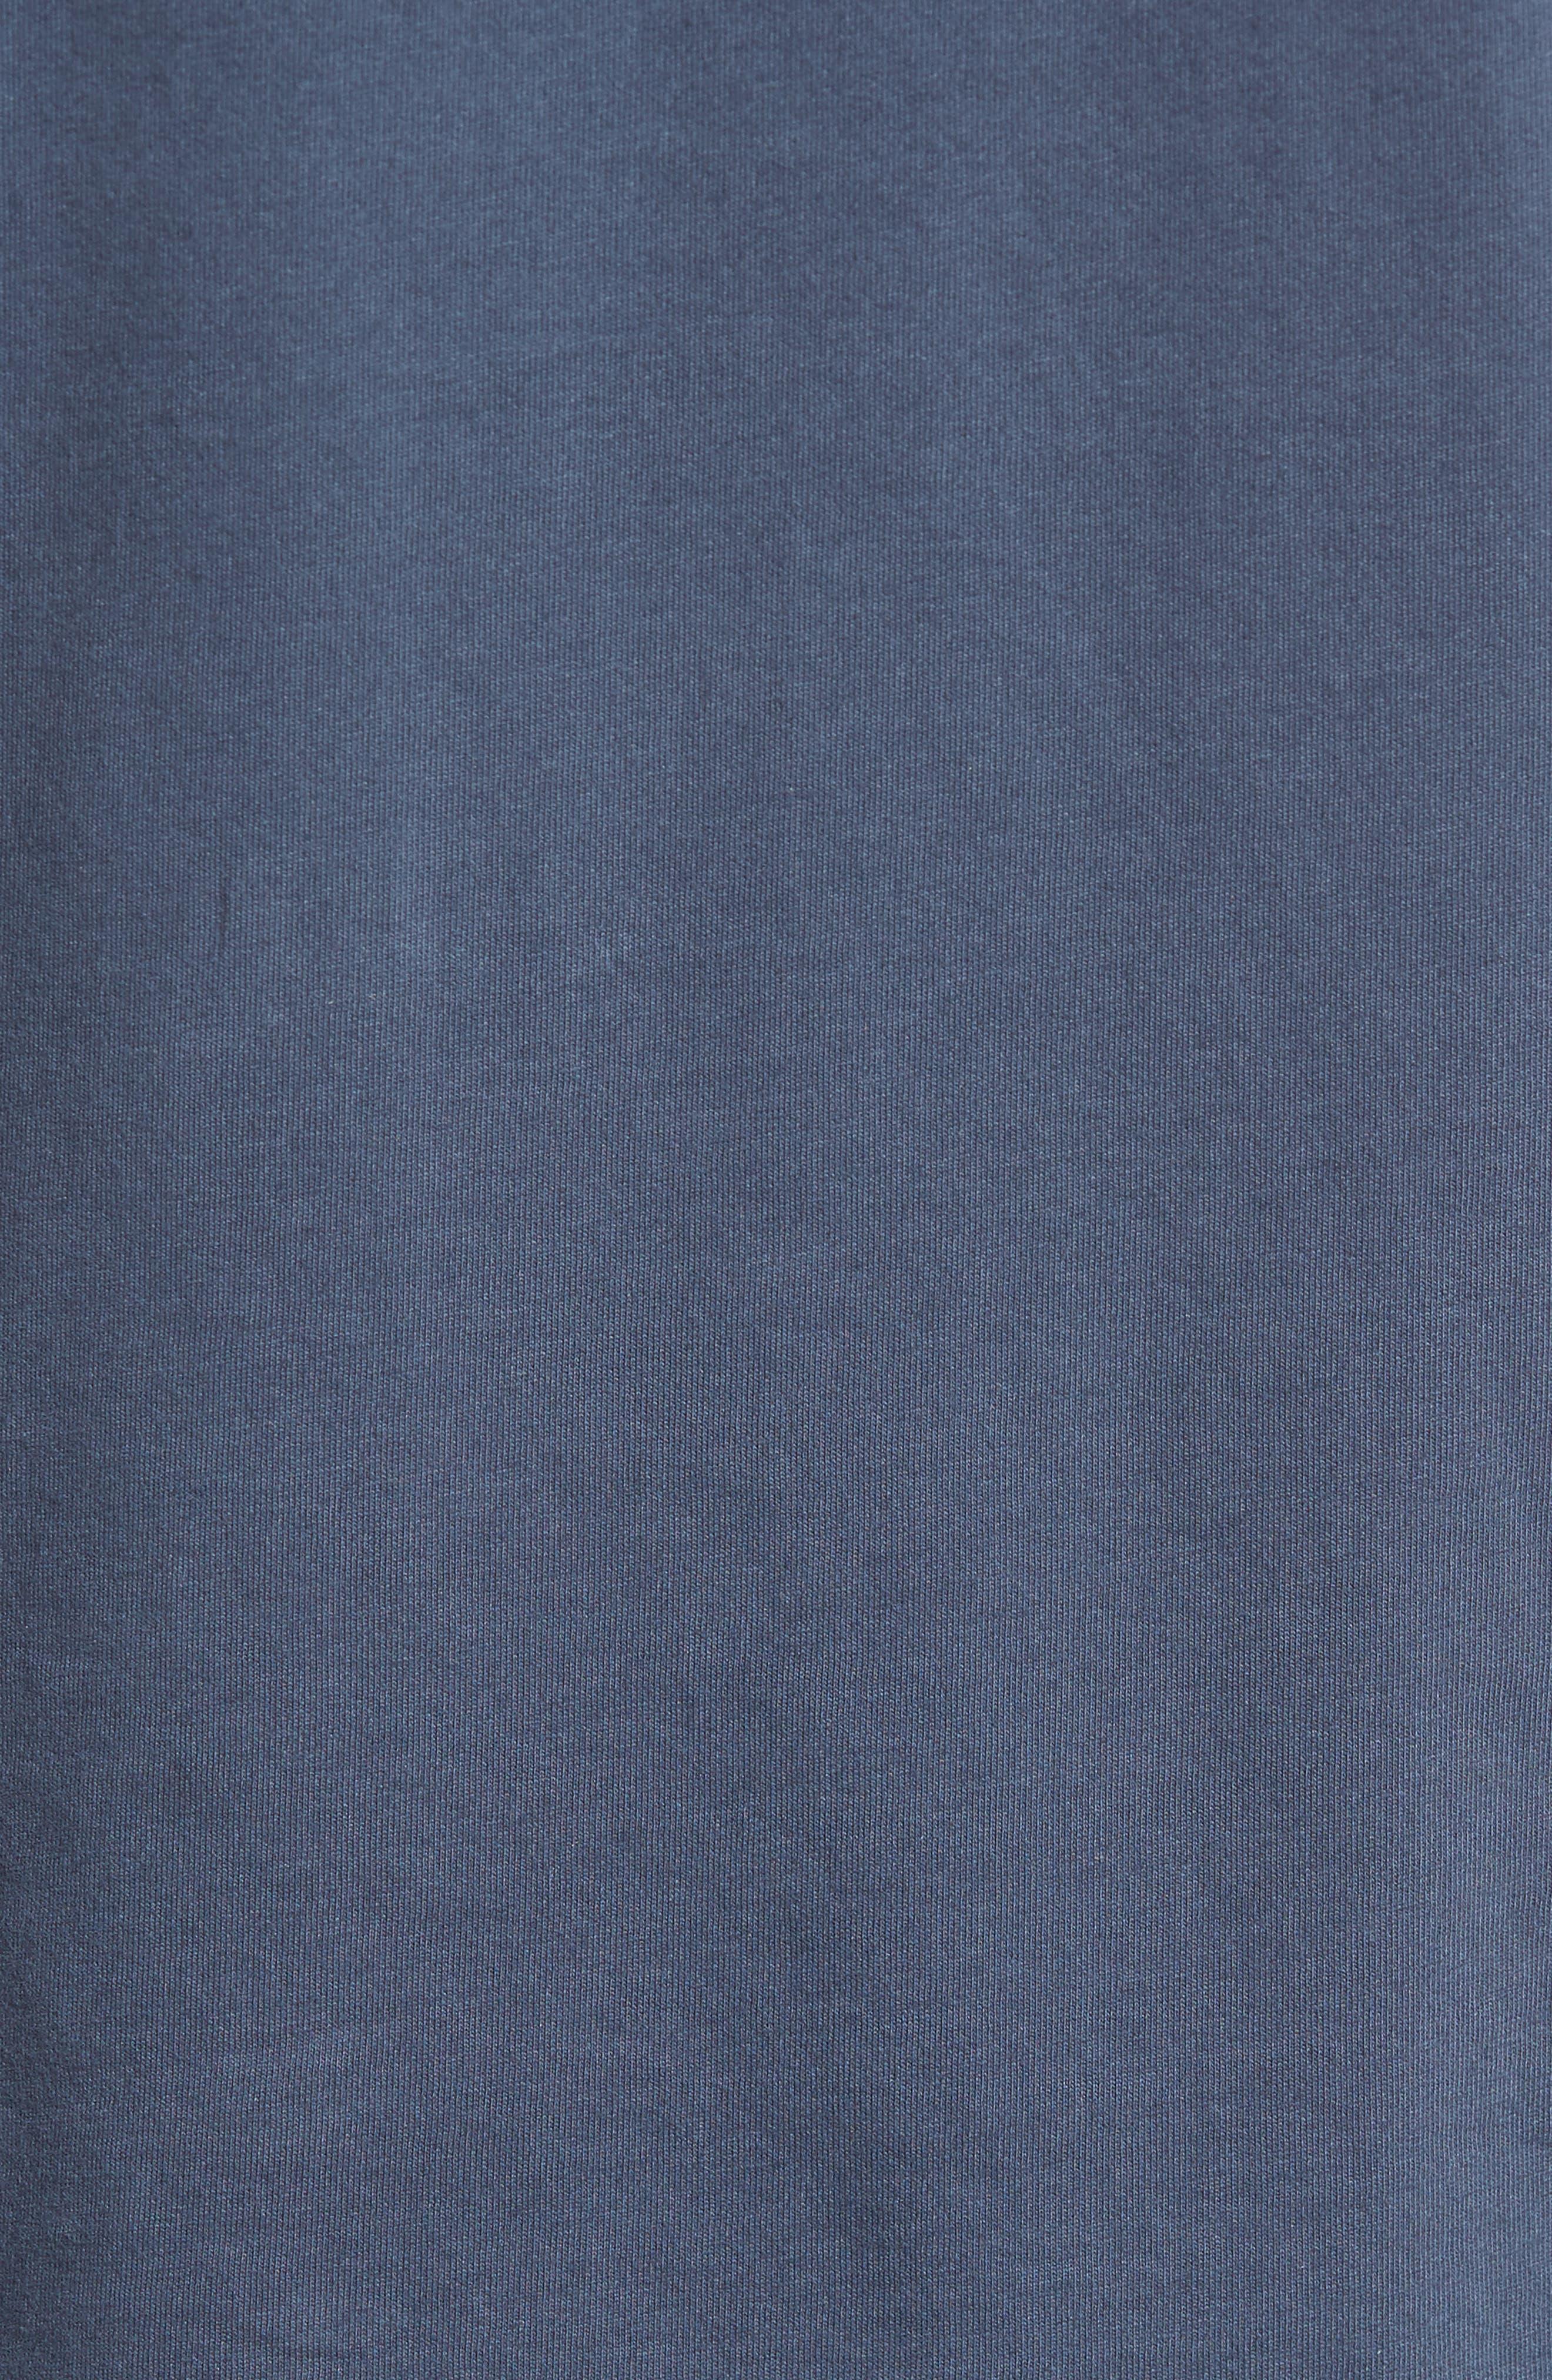 Notch Henley T-Shirt,                             Alternate thumbnail 5, color,                             Vintage Navy